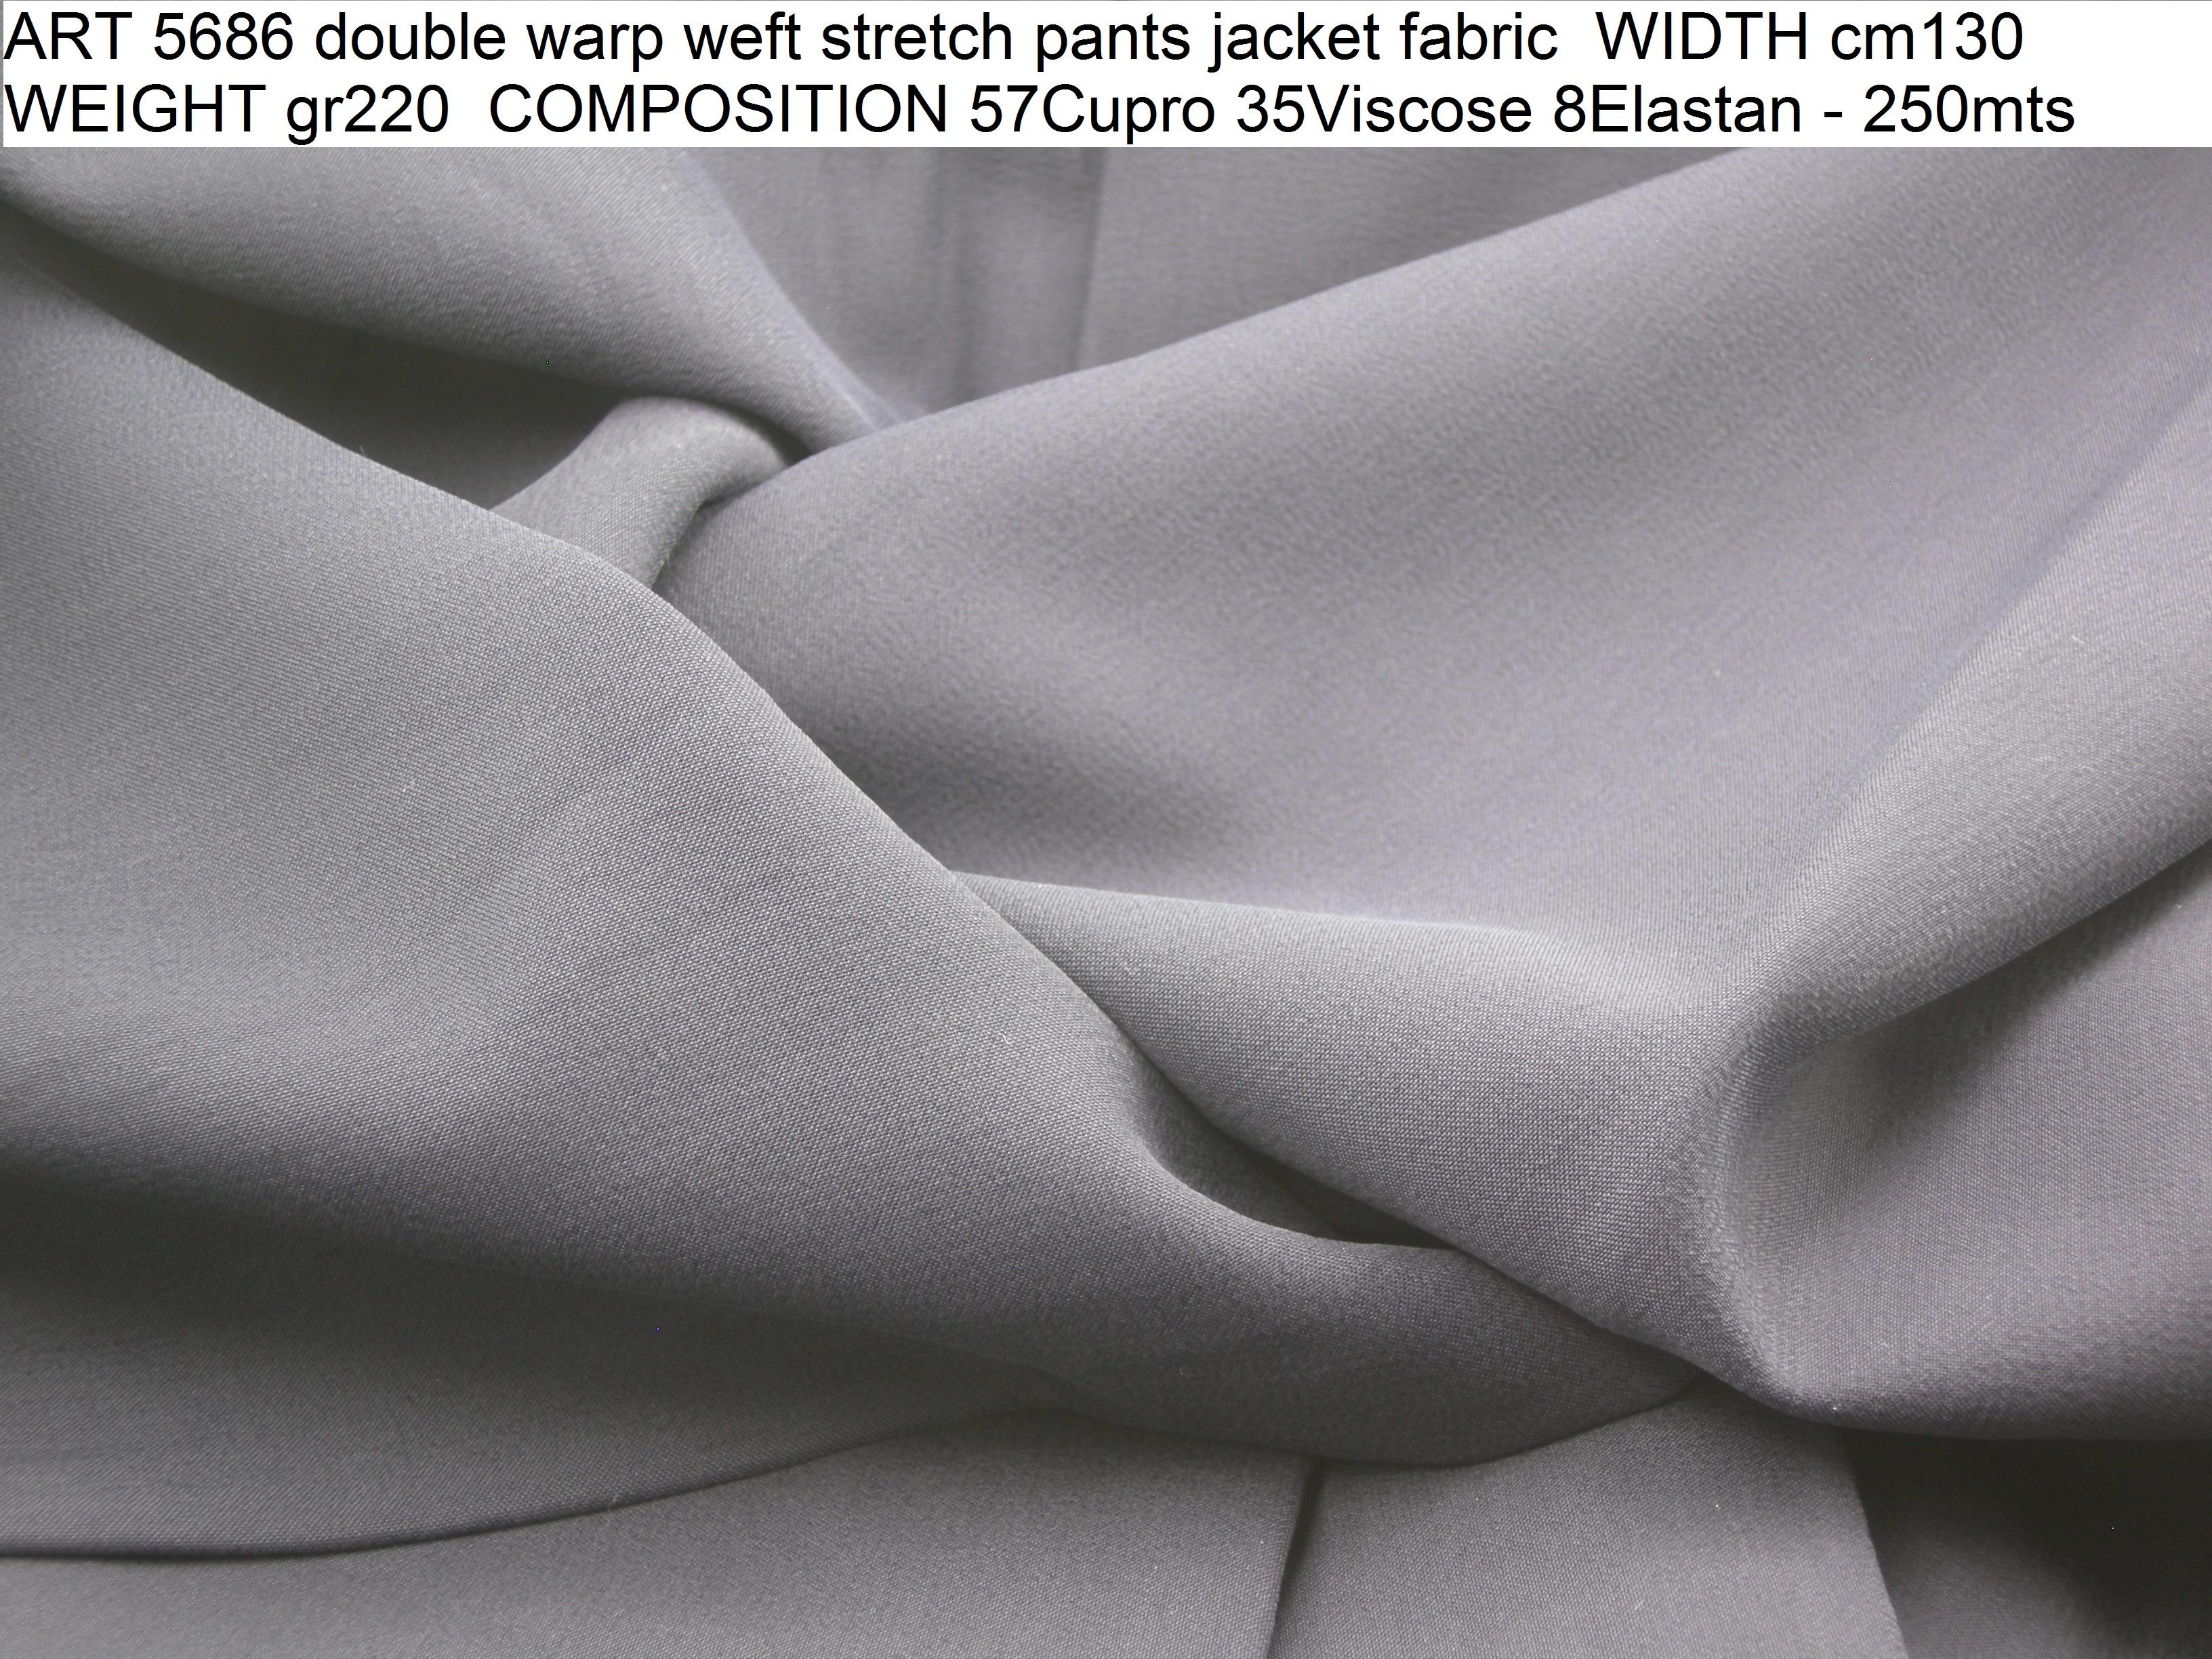 ART 5686 double warp weft stretch pants jacket fabric WIDTH cm130 WEIGHT gr220 COMPOSITION 57Cupro 35Viscose 8Elastan - 250mts